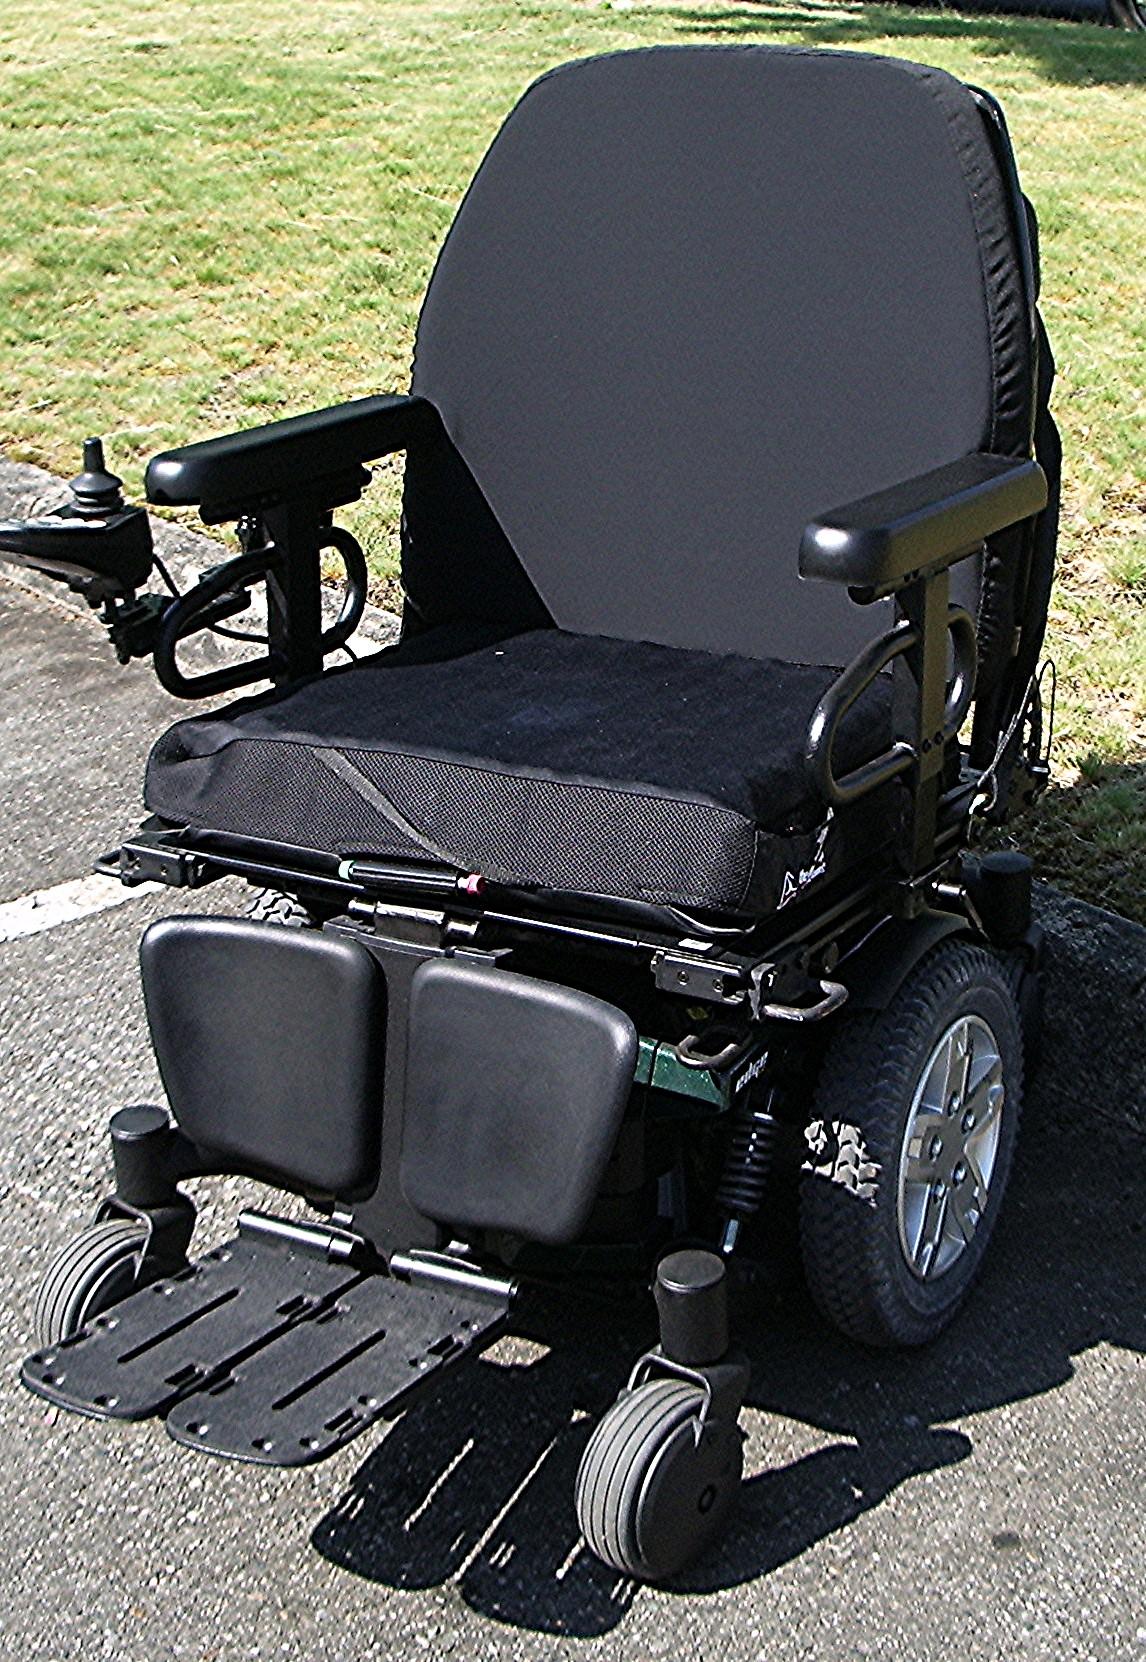 products full zero massagechair chair atom comtek body luxury black quantum massage gravity fda